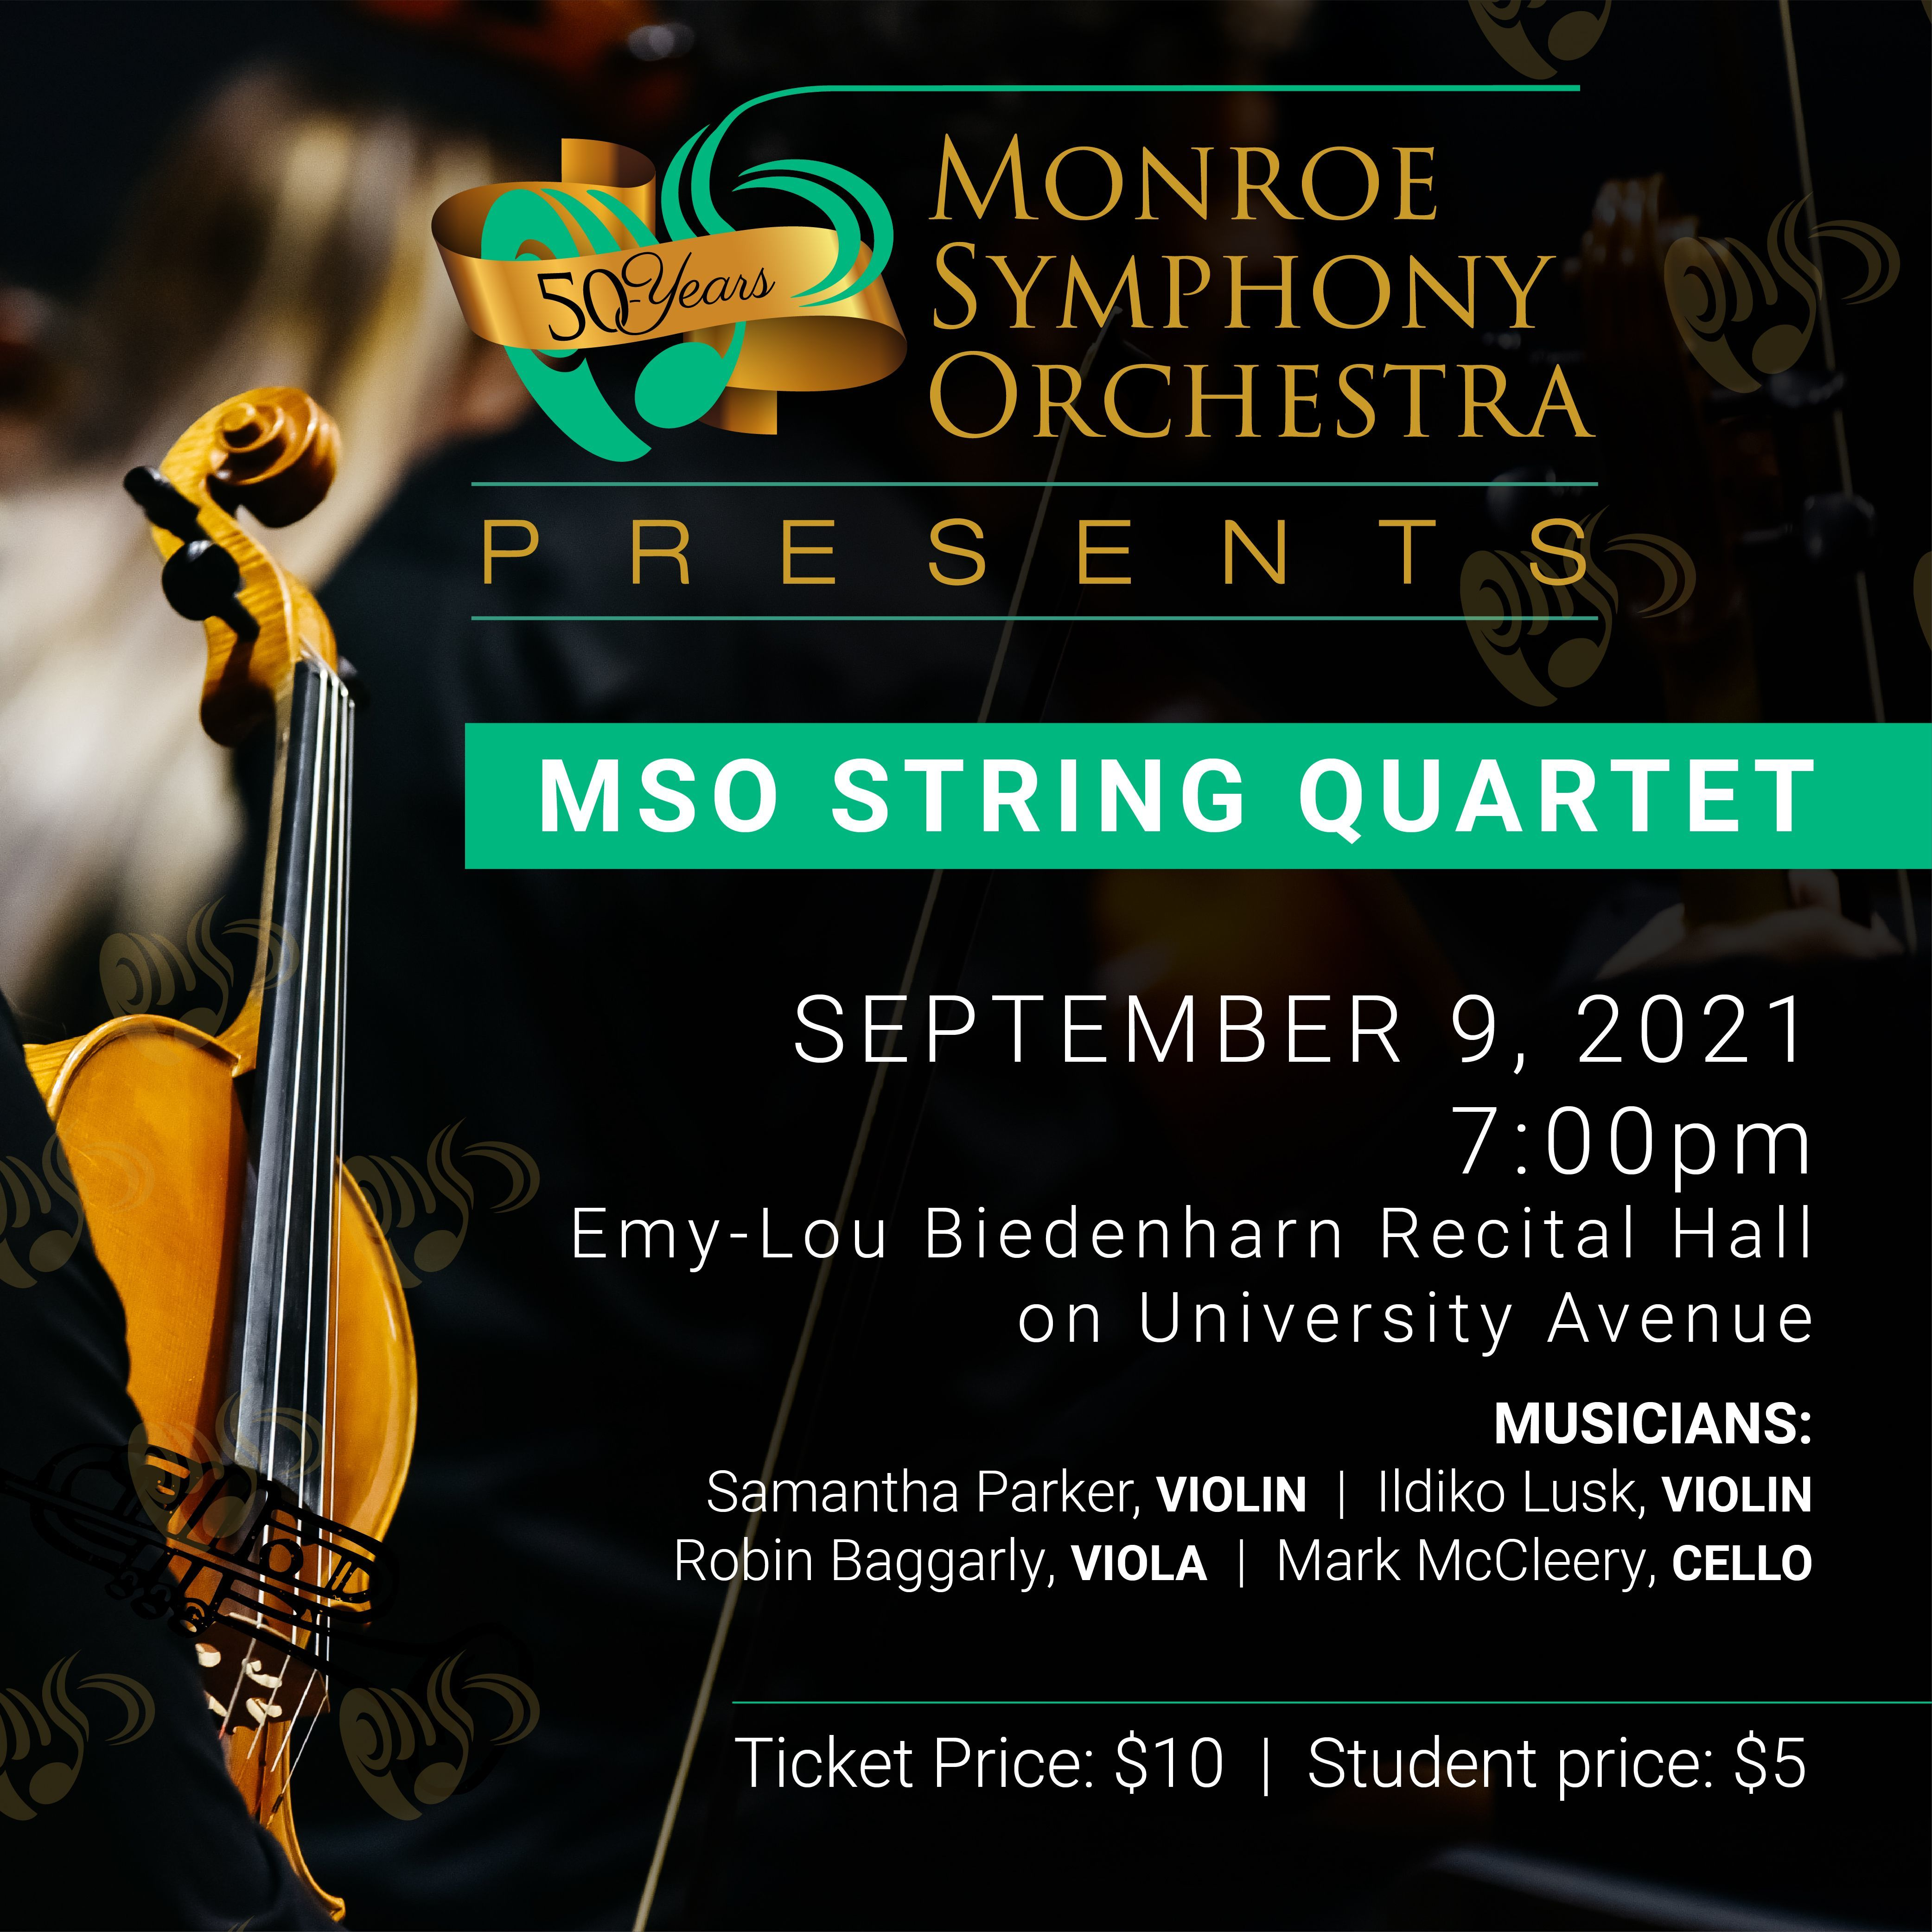 MSO Presents: MSO String Quartet